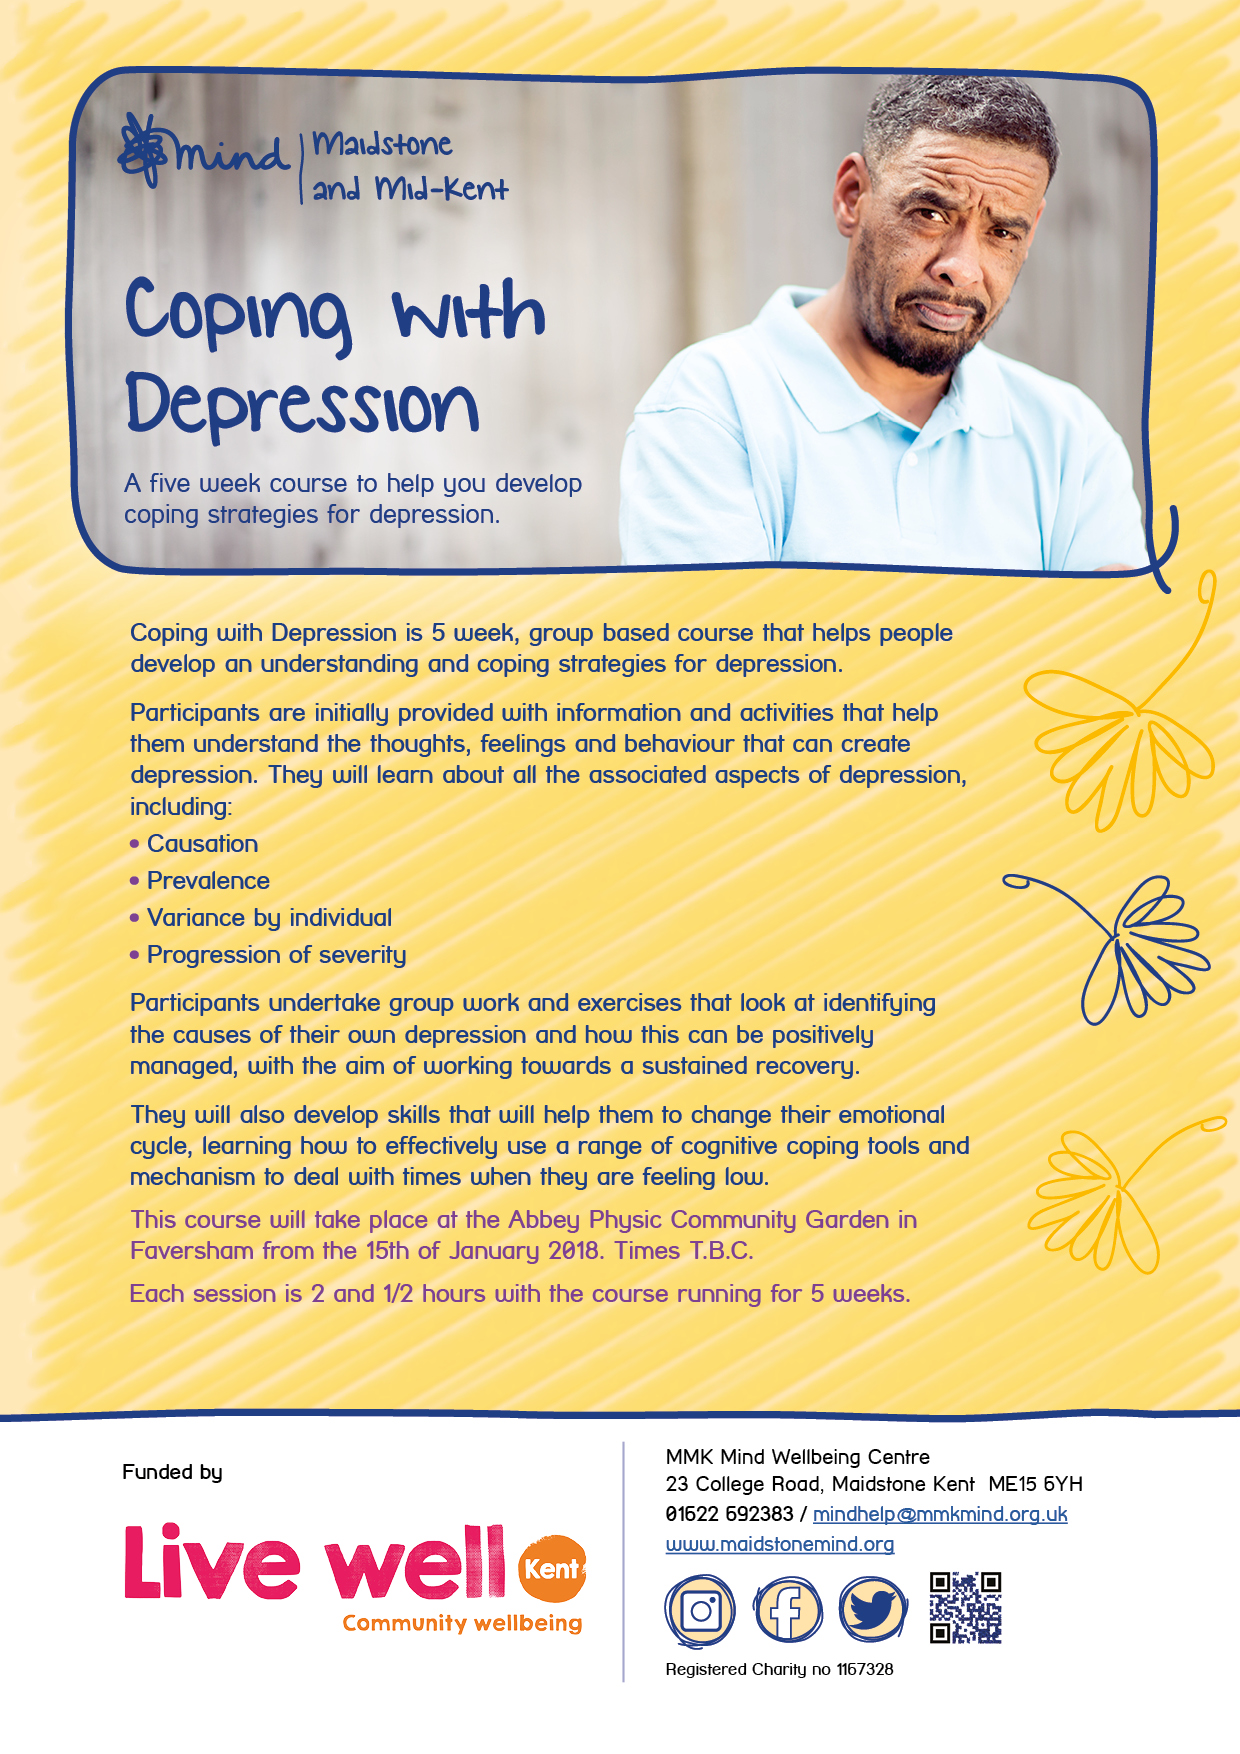 coping with depression - faversham january 2018